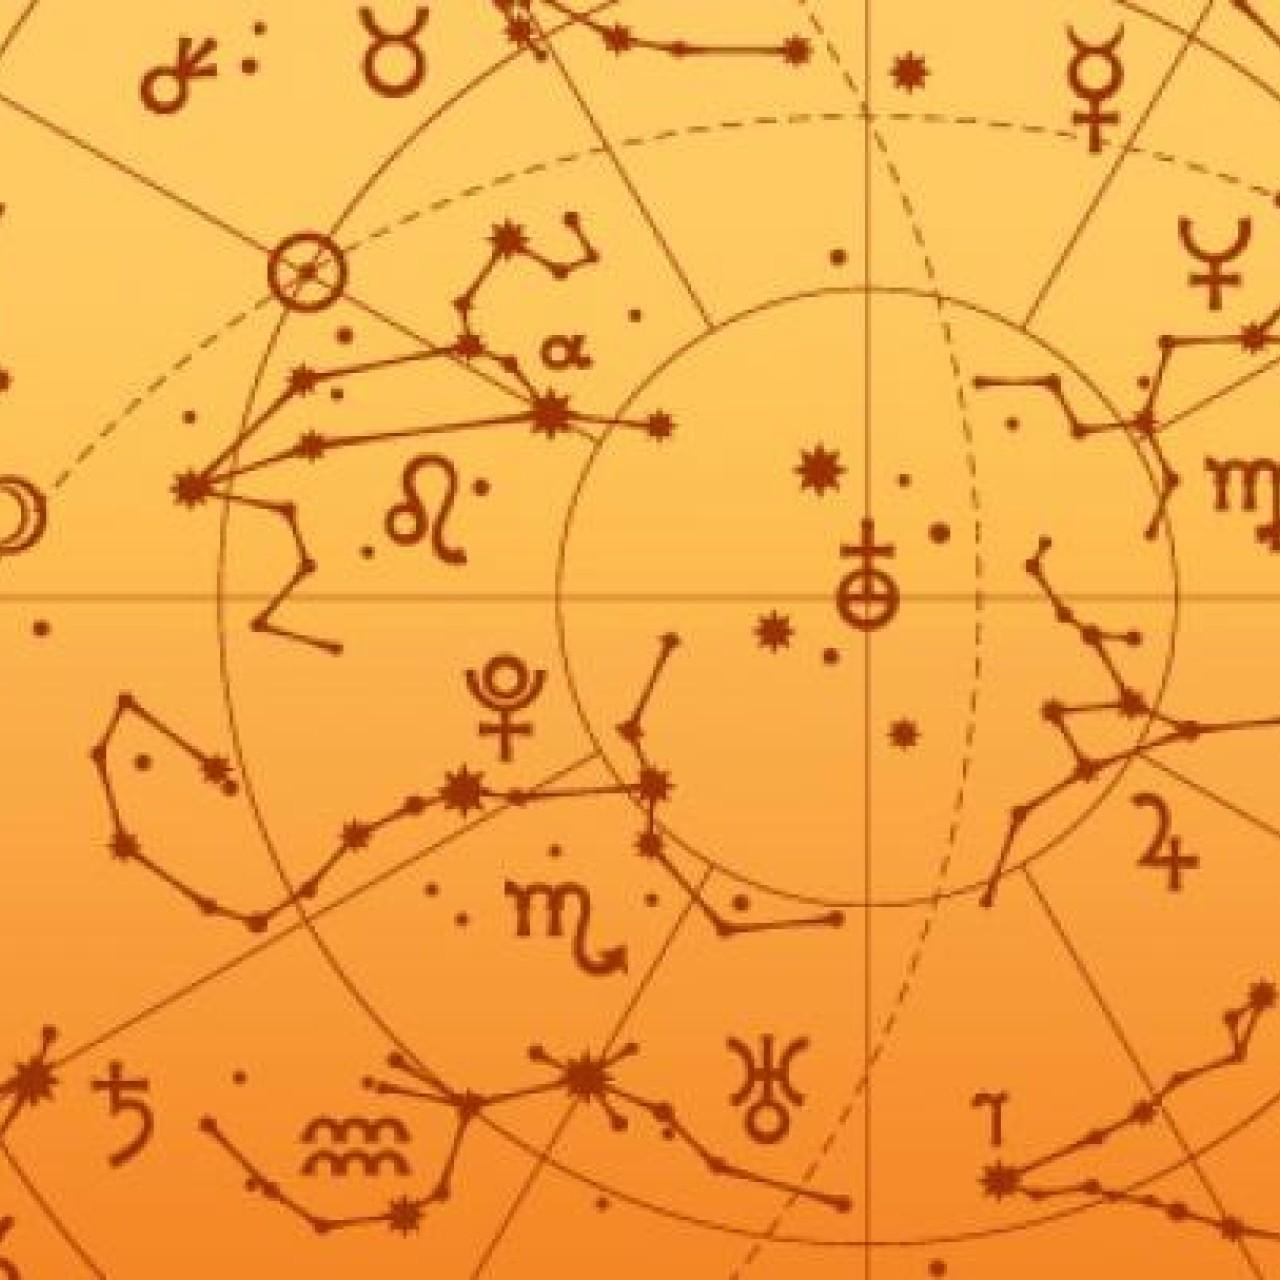 Horoscope: 16 02 2019 | South China Morning Post